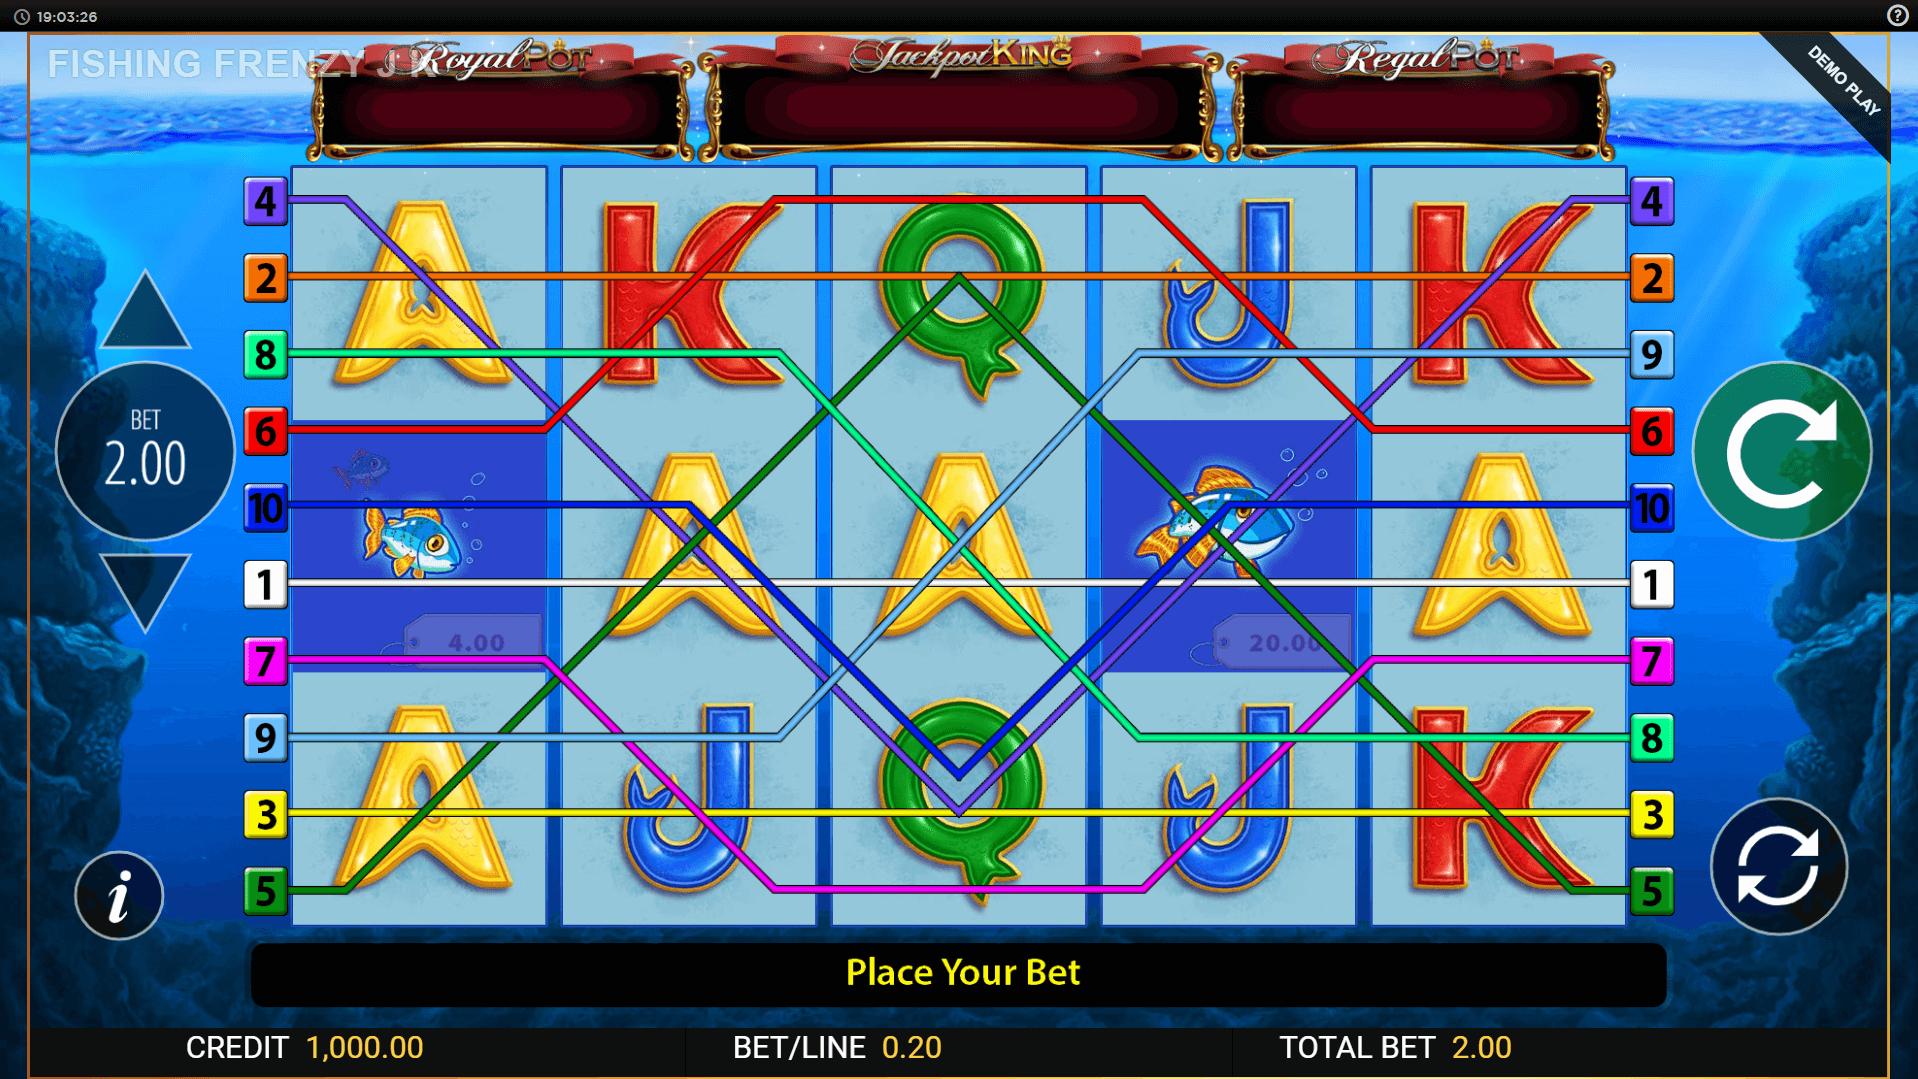 Fishin Frenzy Jackpot King slot machine screenshot